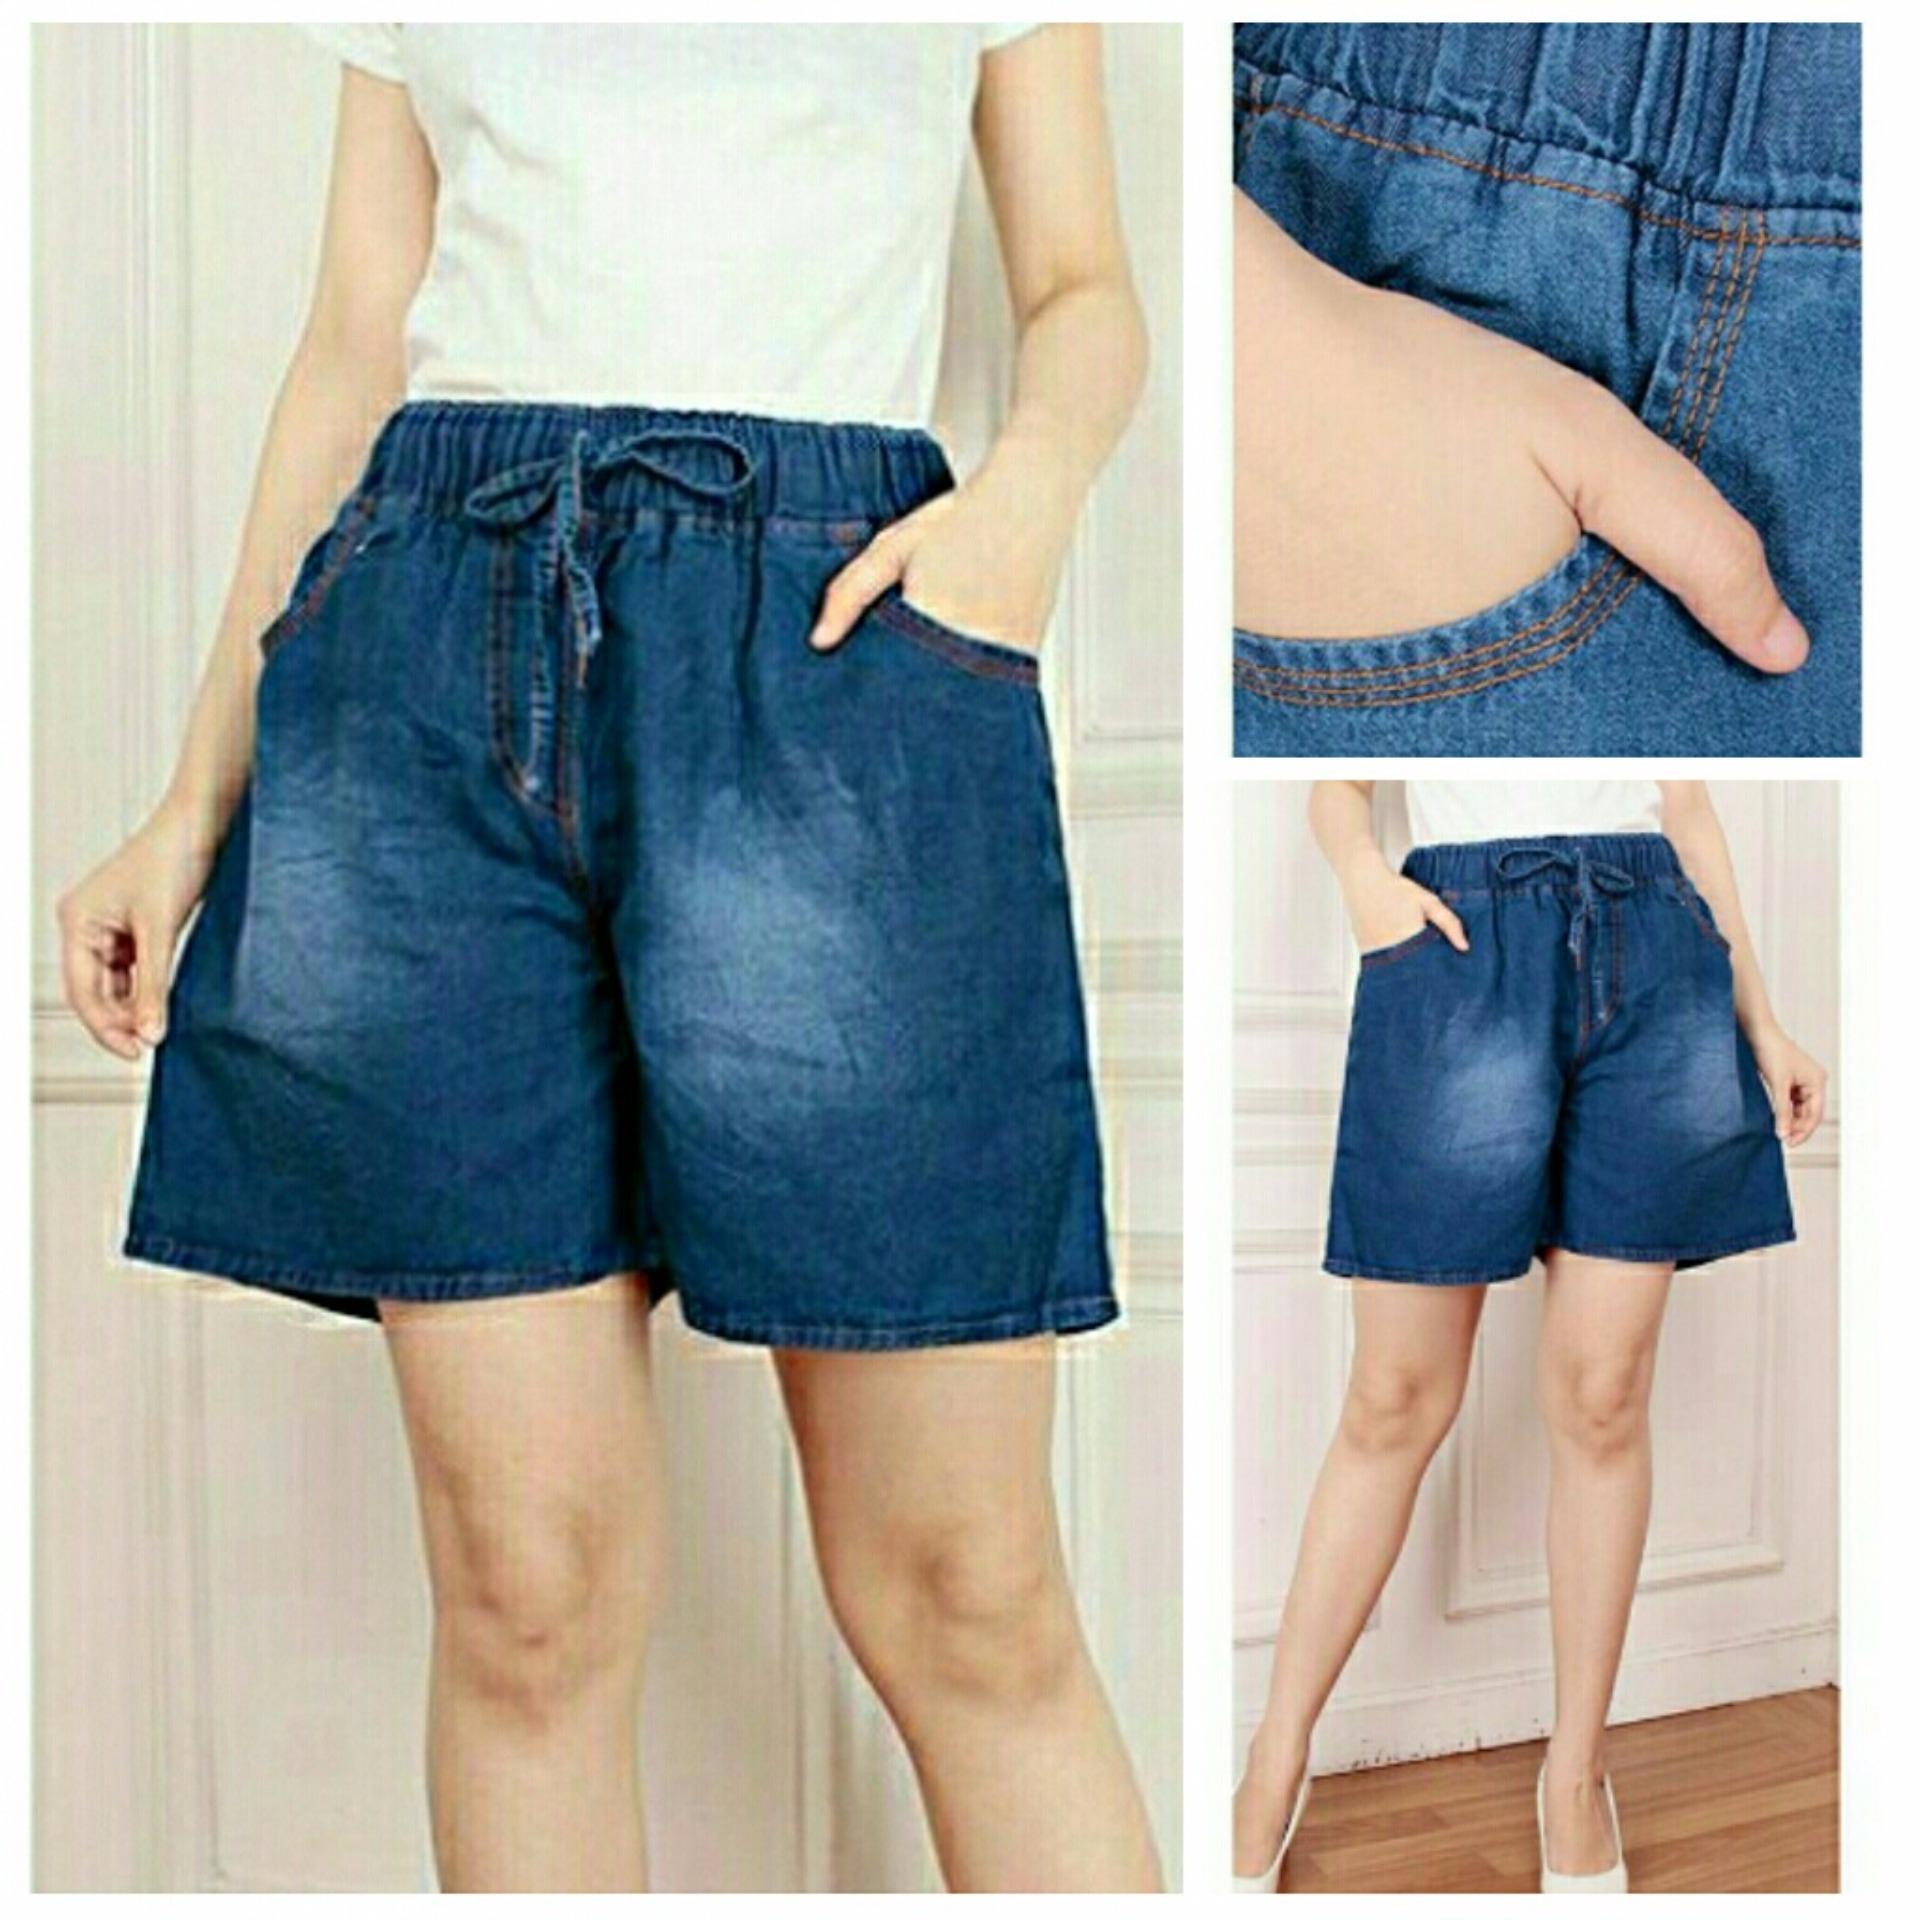 Beli Cj Collection Celana Jeans Jumbo Pendek Hotpant Wanita Jumbo Short Pant Savita Celana